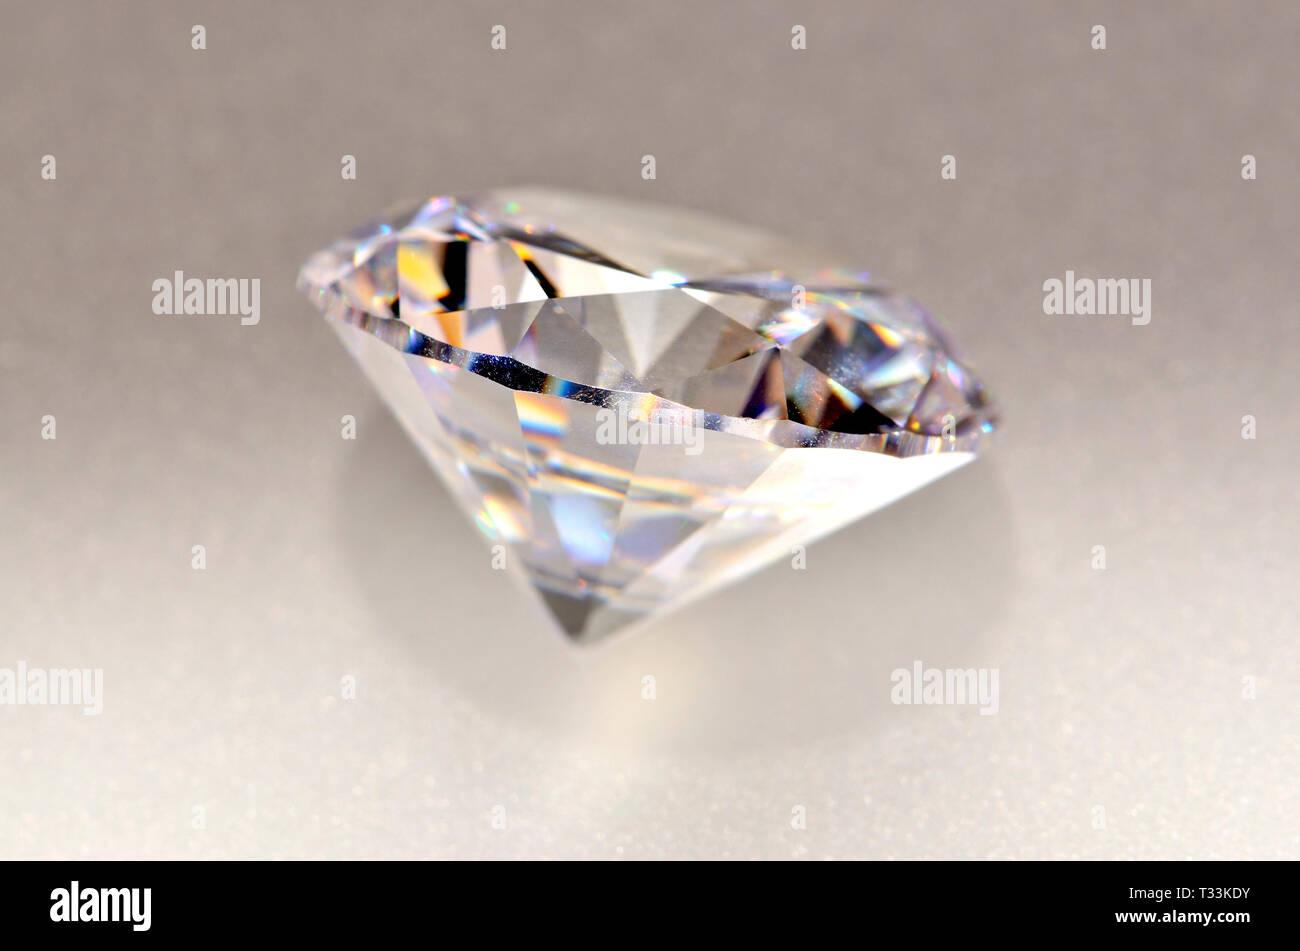 Diamante de corte redondo (Sintético - zirconia cúbico) Imagen De Stock